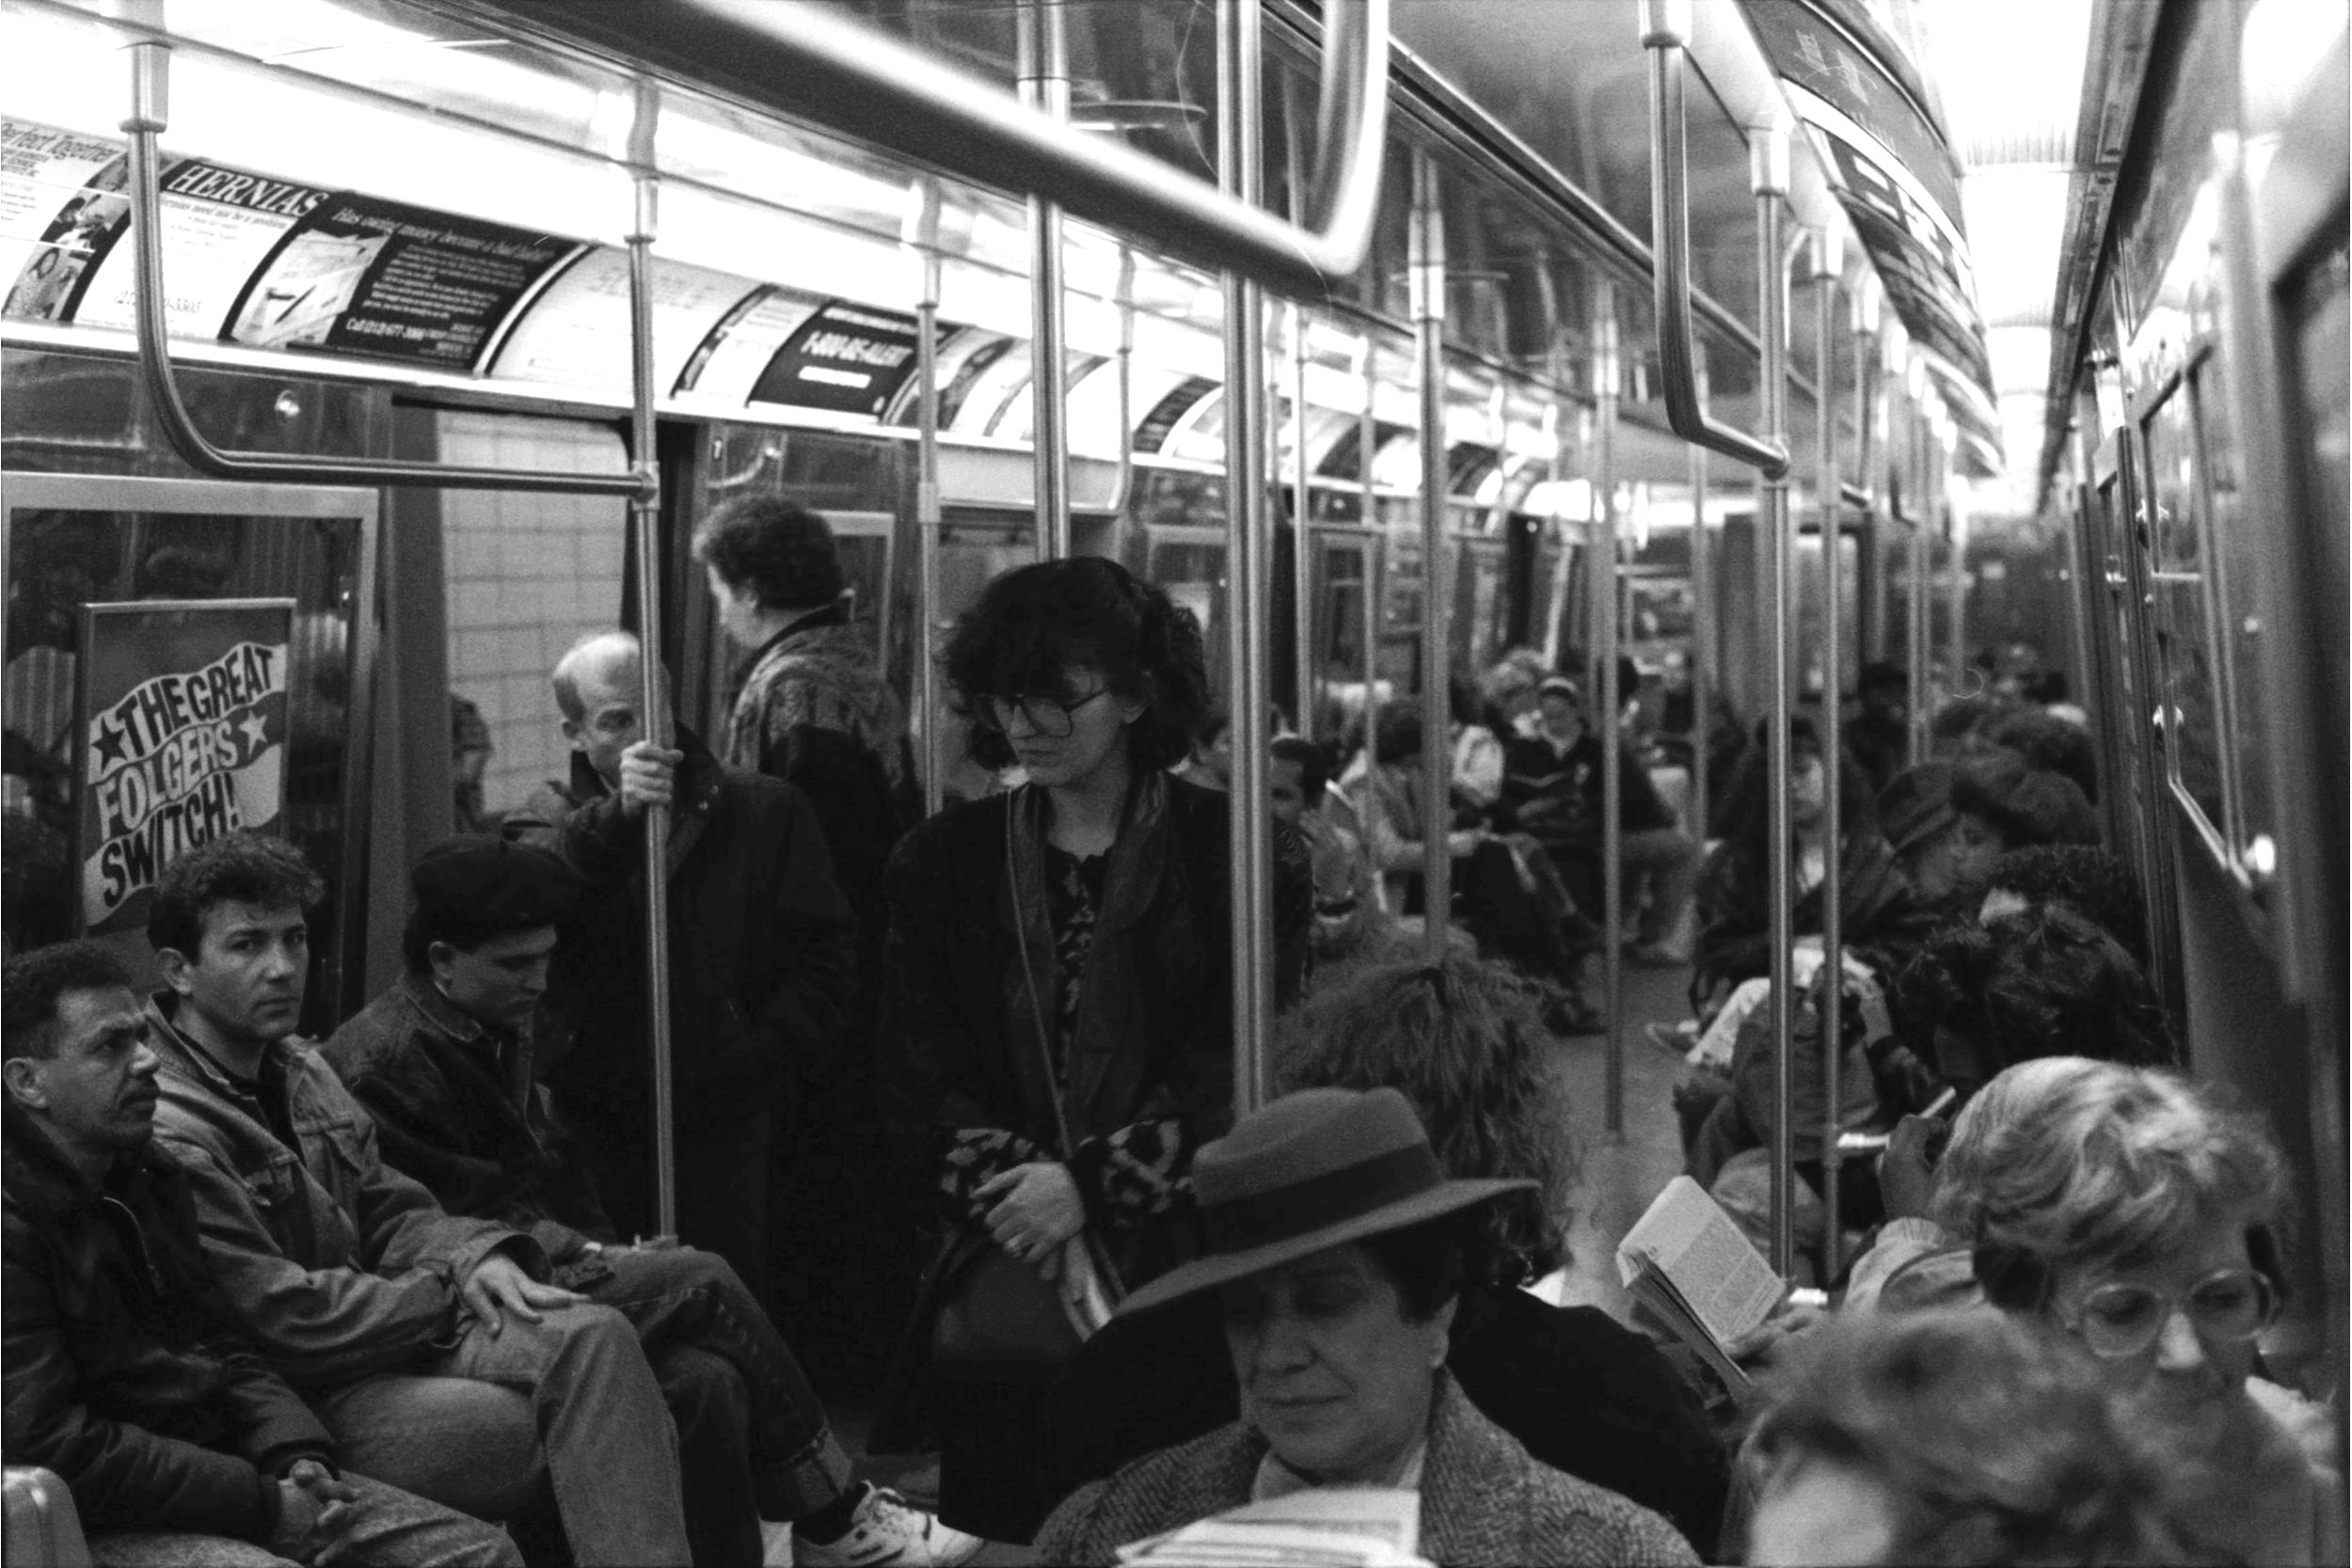 Subway, undated